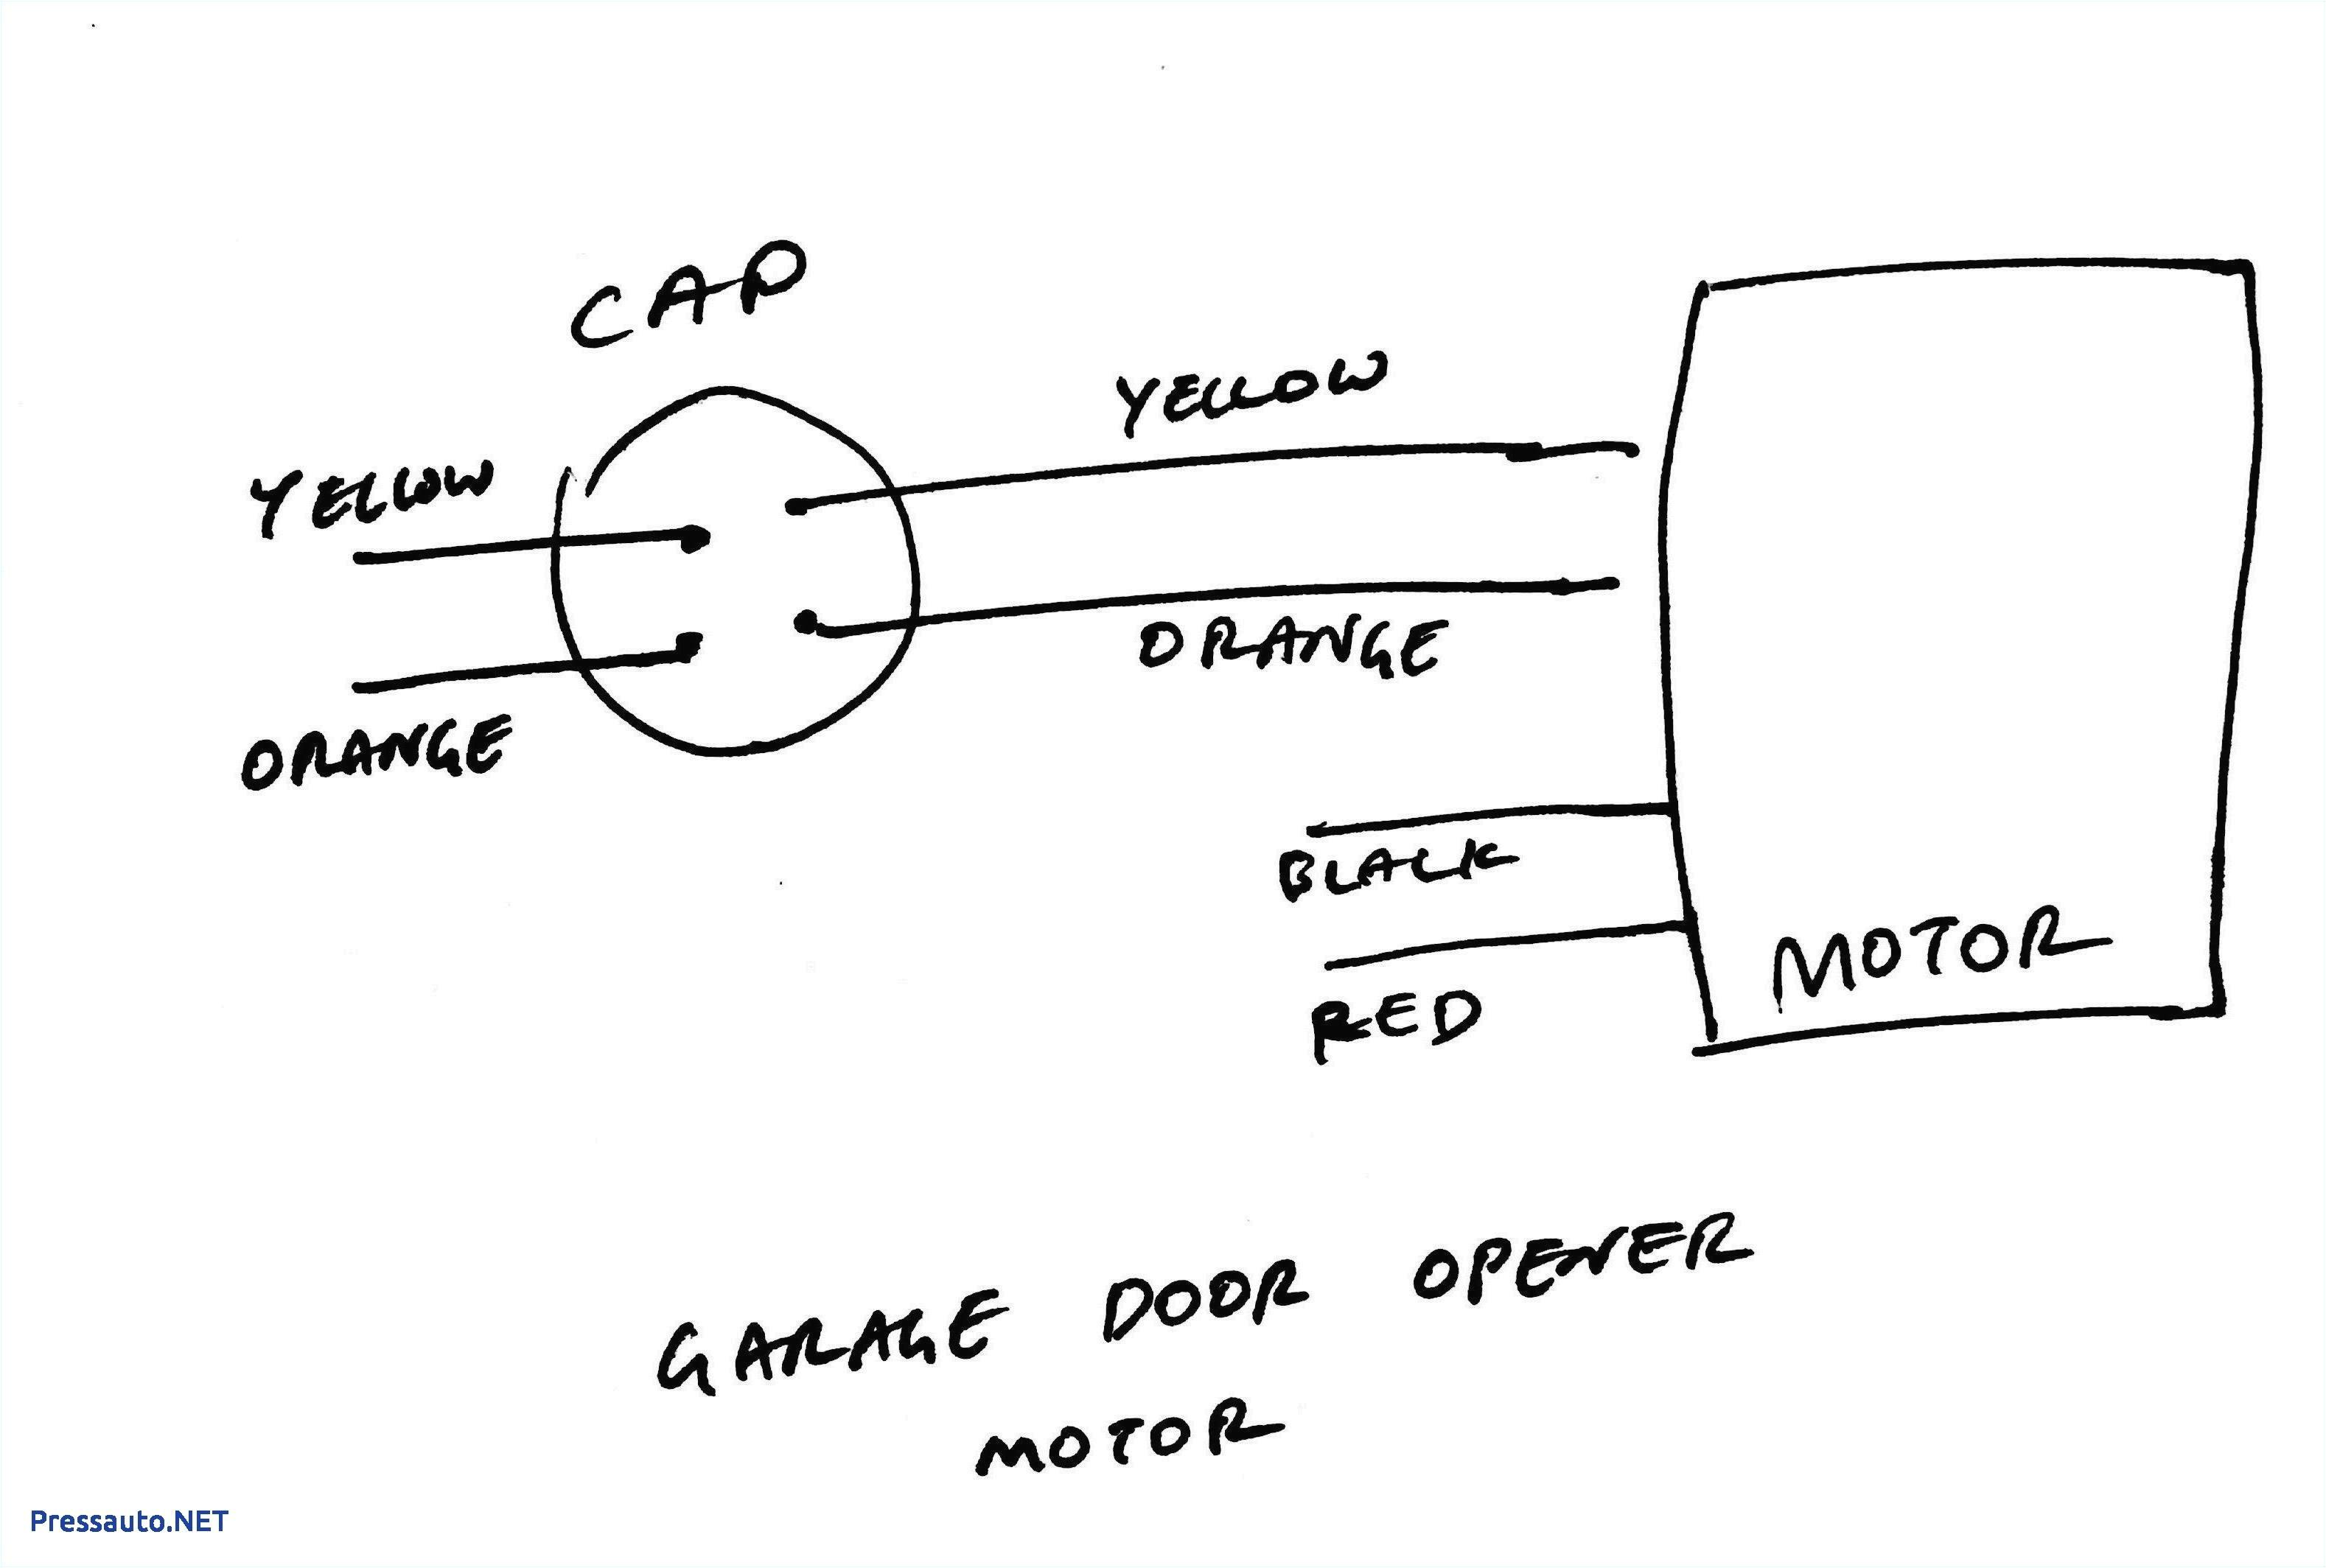 sdmo t11 dc wiring diagram wiring diagrams sdmo t11 dc wiring diagram